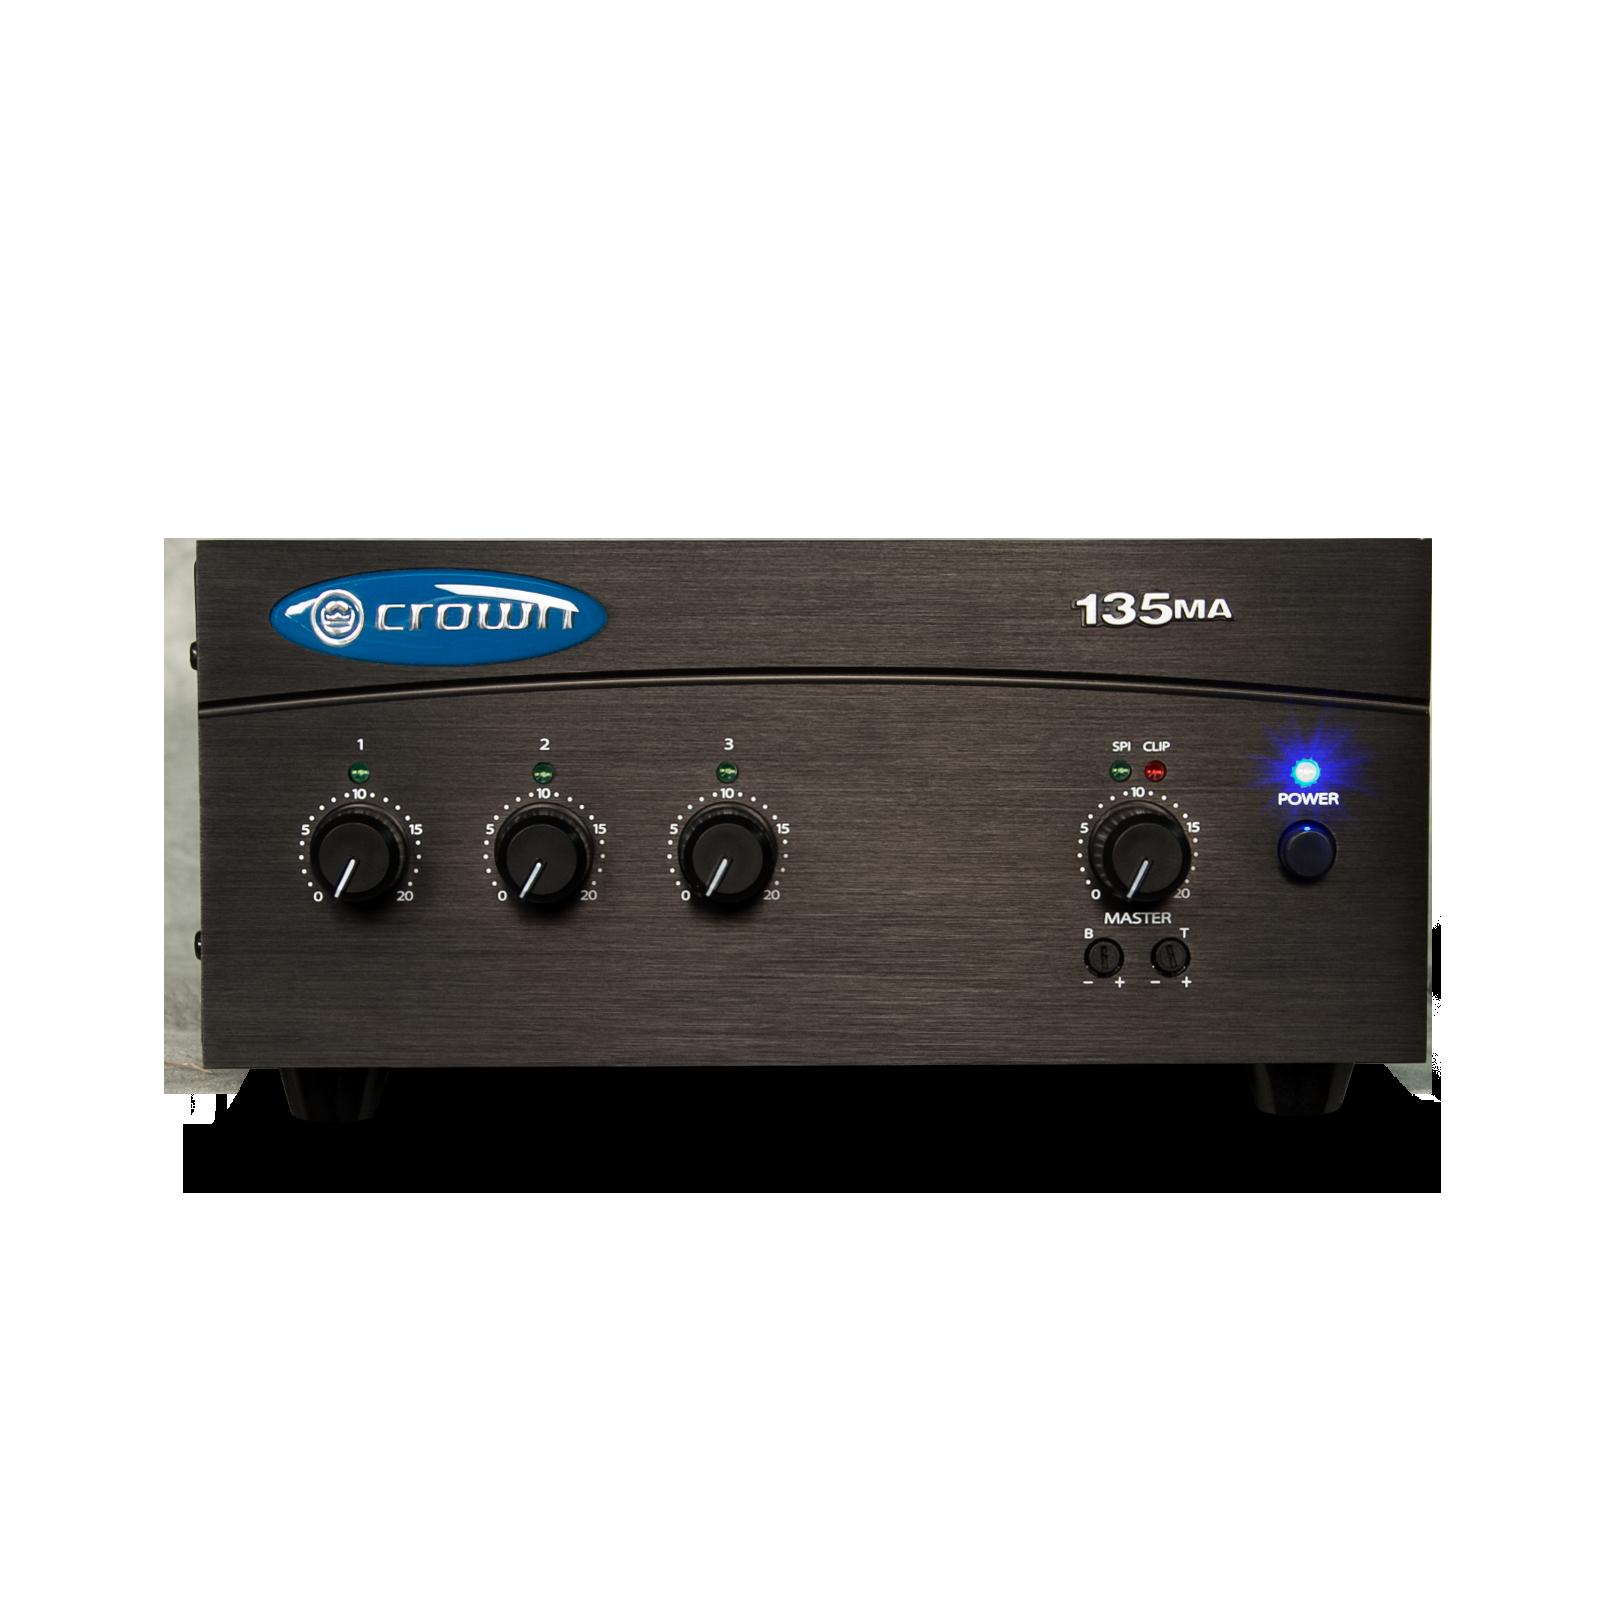 135MA (B-Stock) - Black - Three Input, 35W Mixer-Amplifier - Hero